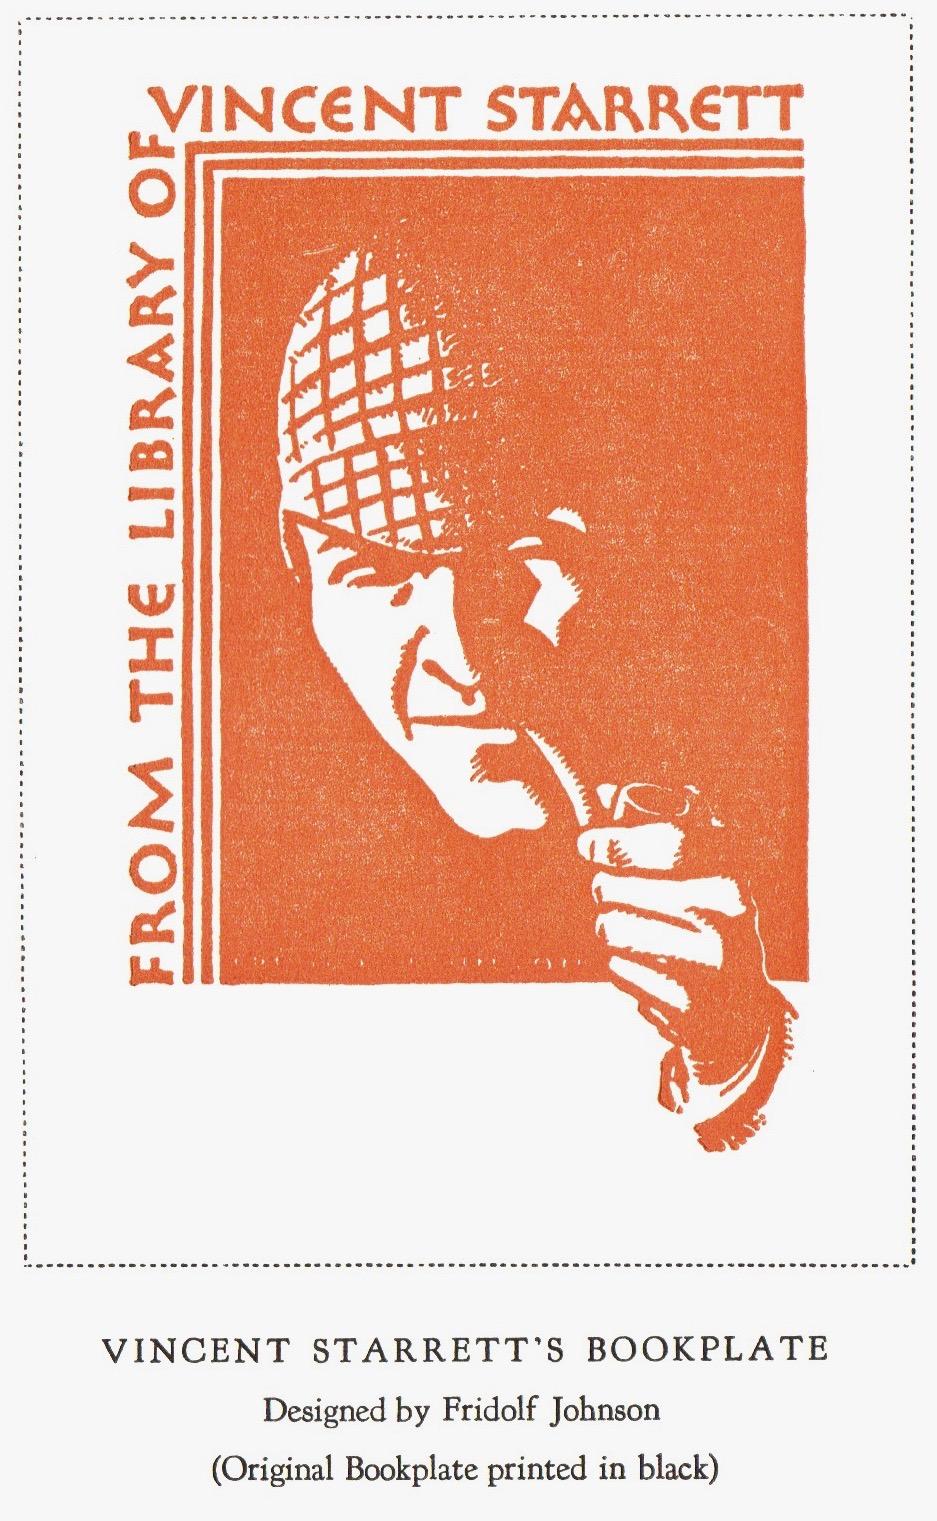 Sherlockian bookplates title page .jpg